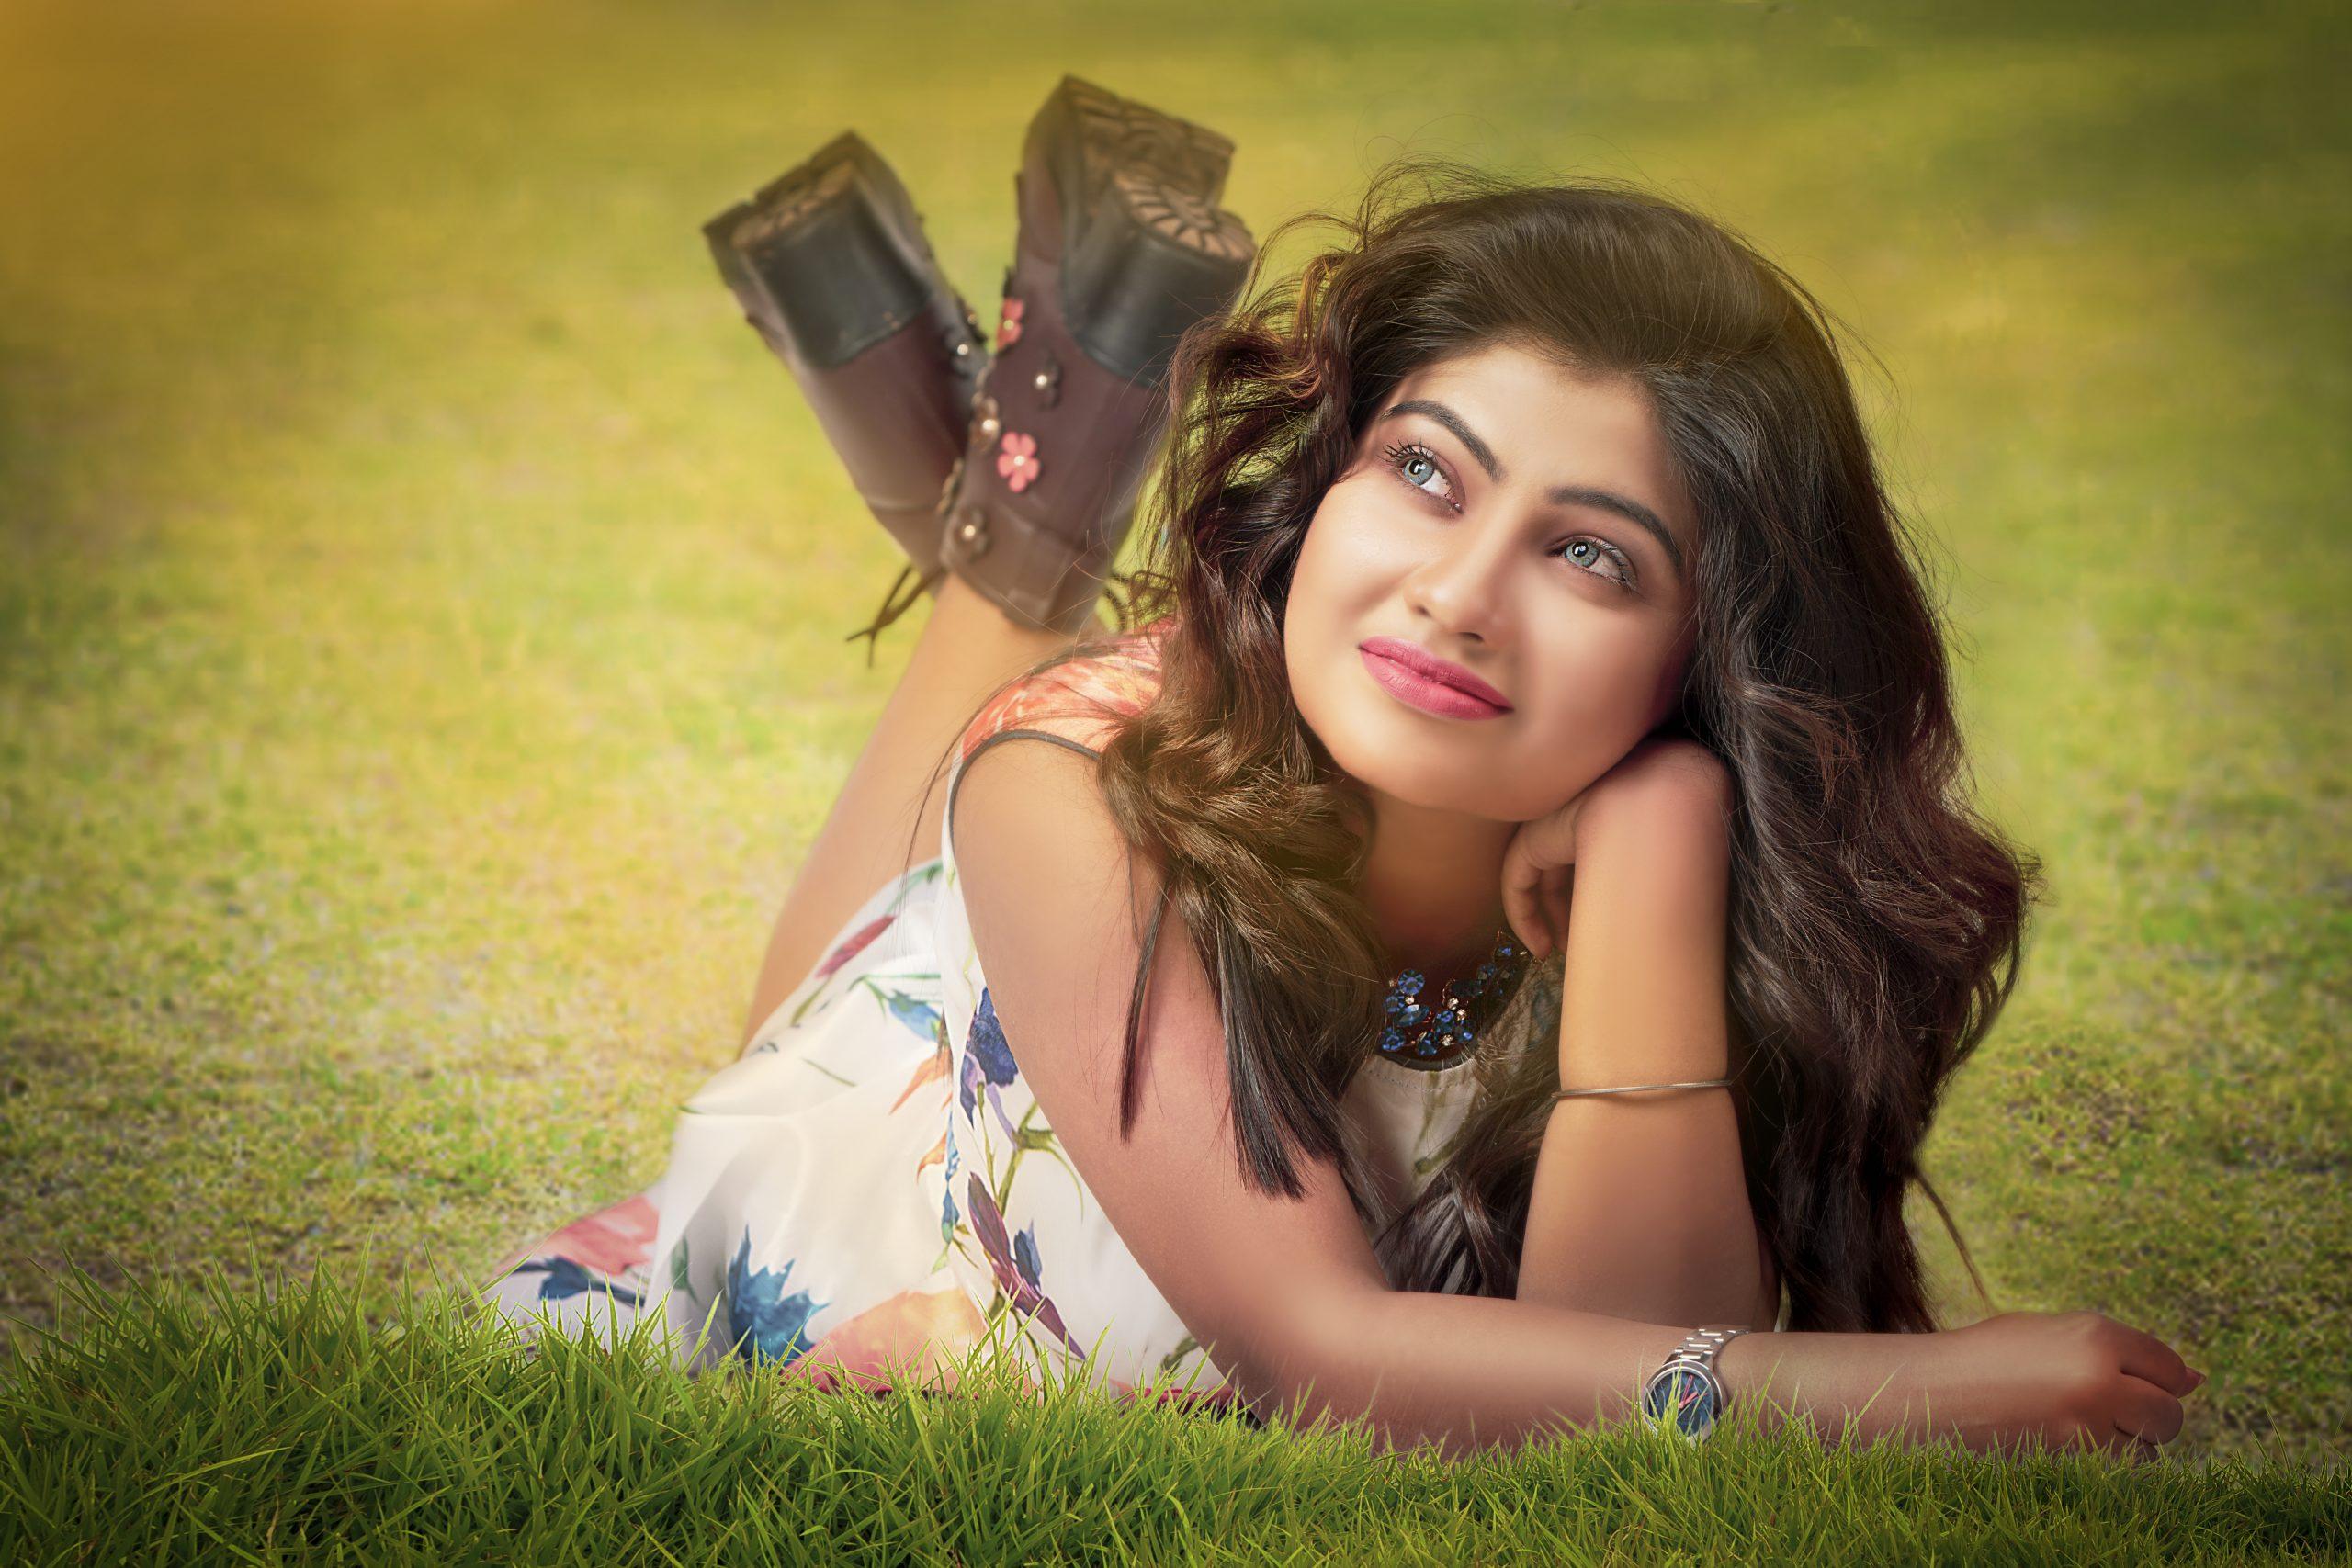 A beautiful girl laying on grass